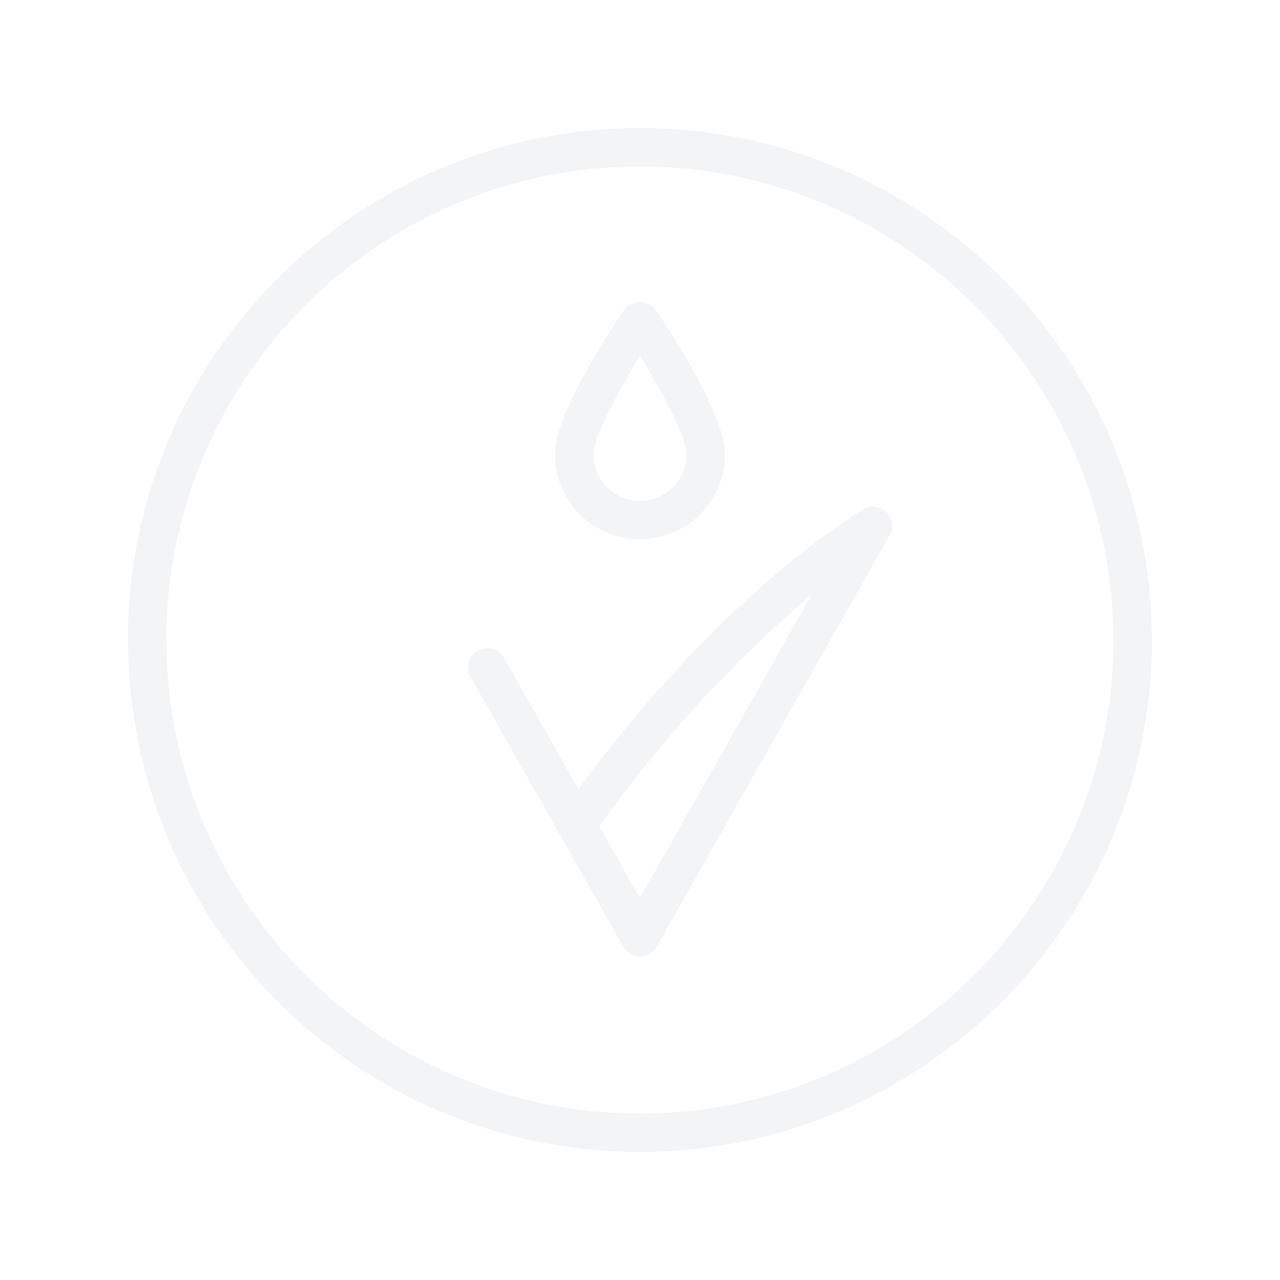 ORGANIC SHOP Lotus & 5 Oils Body Cream 250ml